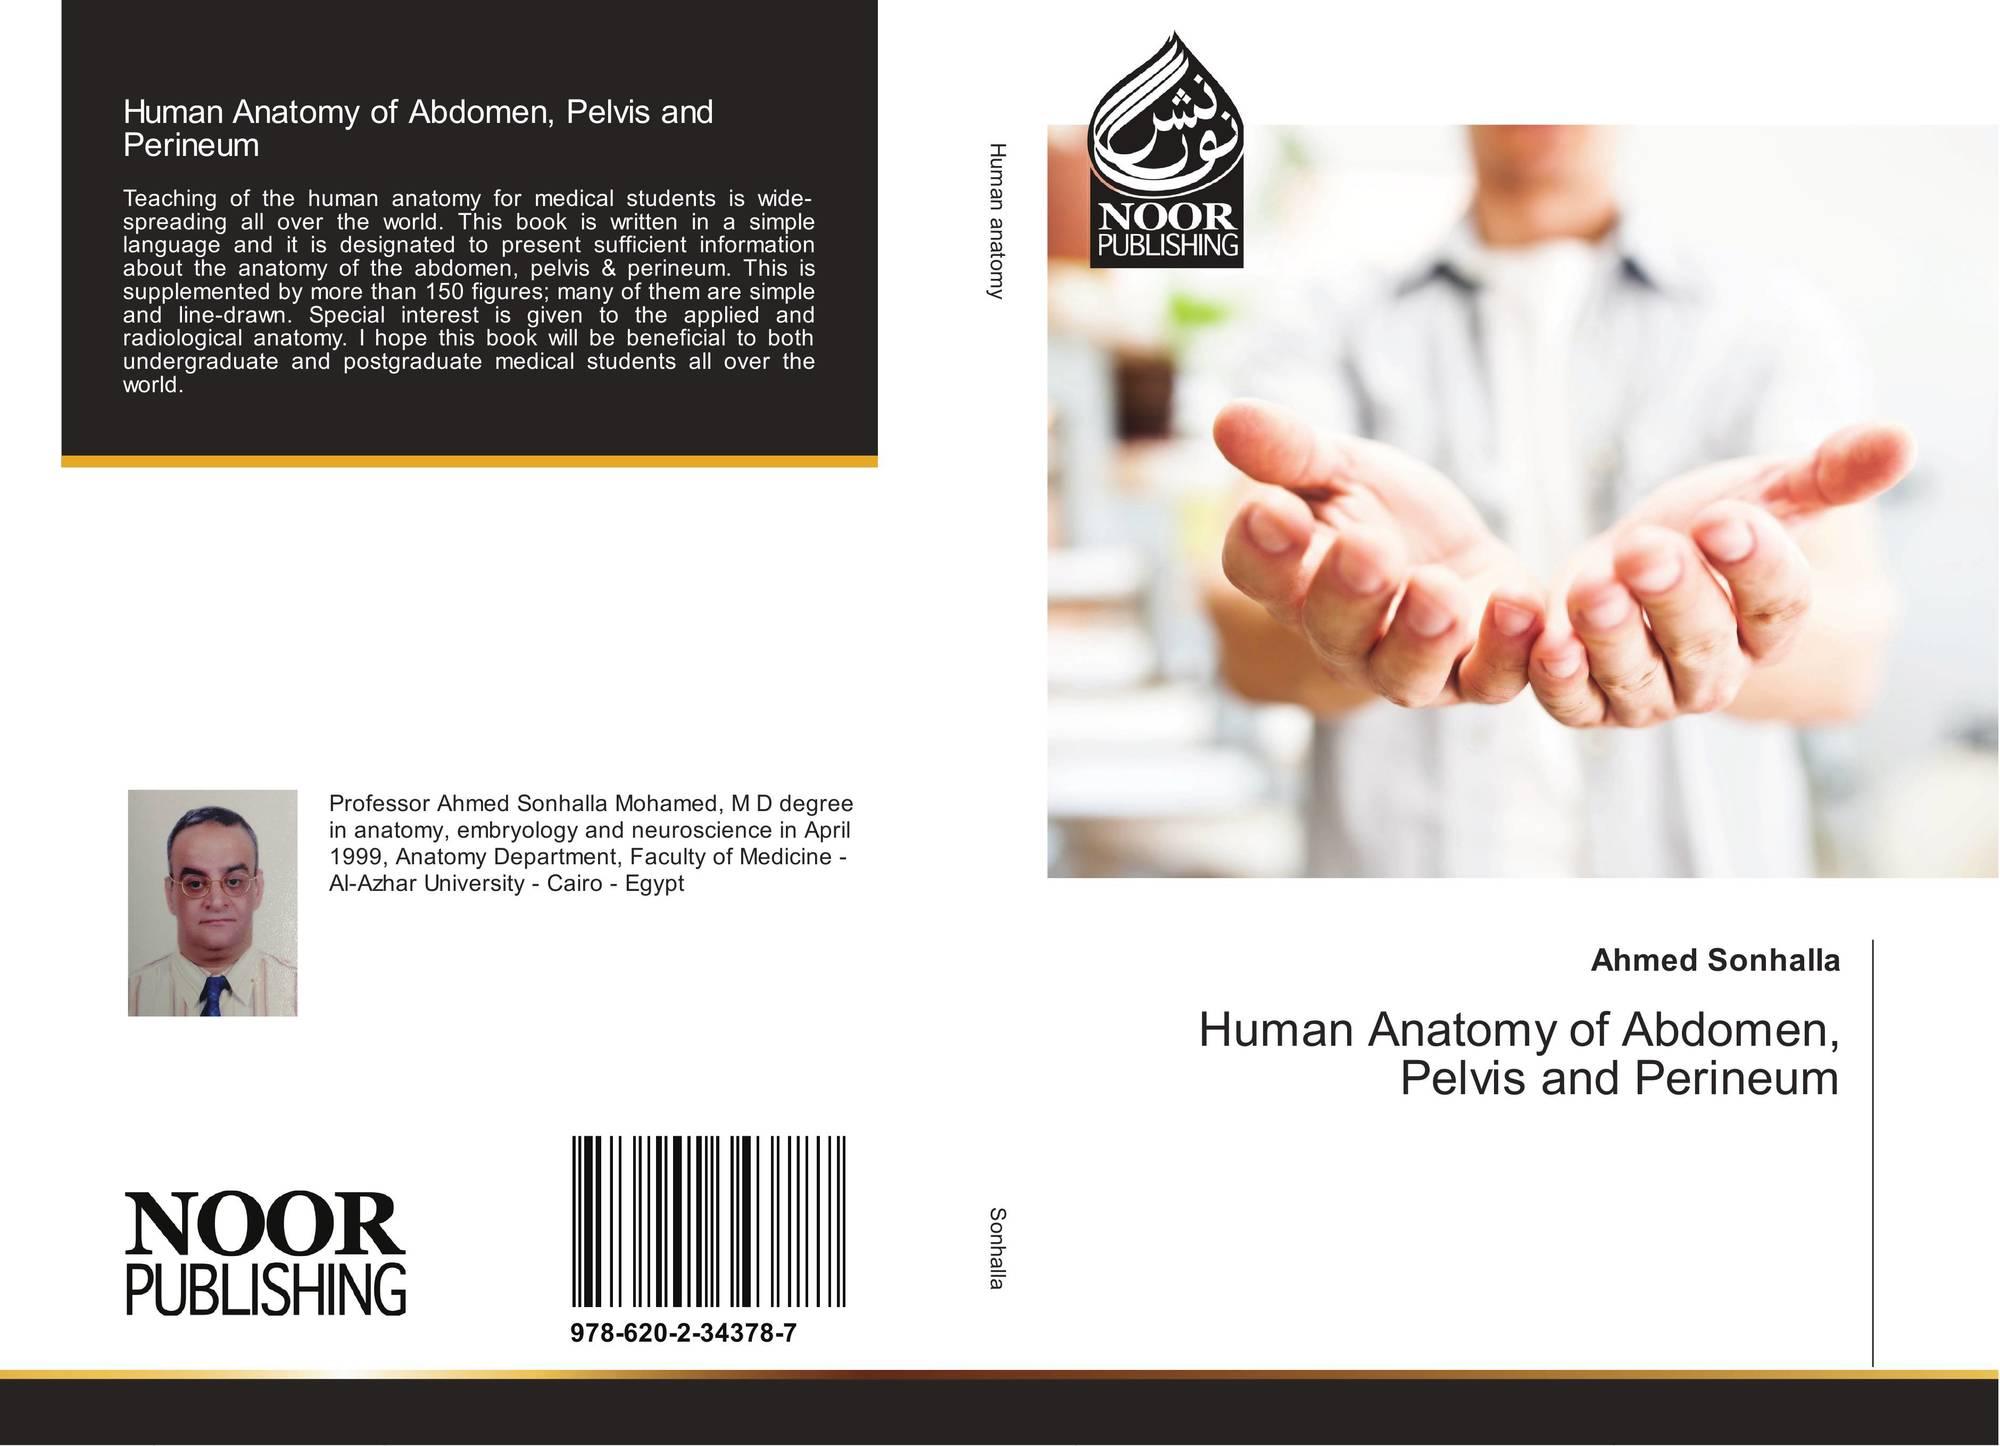 Human Anatomy of Abdomen, Pelvis and Perineum, 978-620-2-34378-7 ...